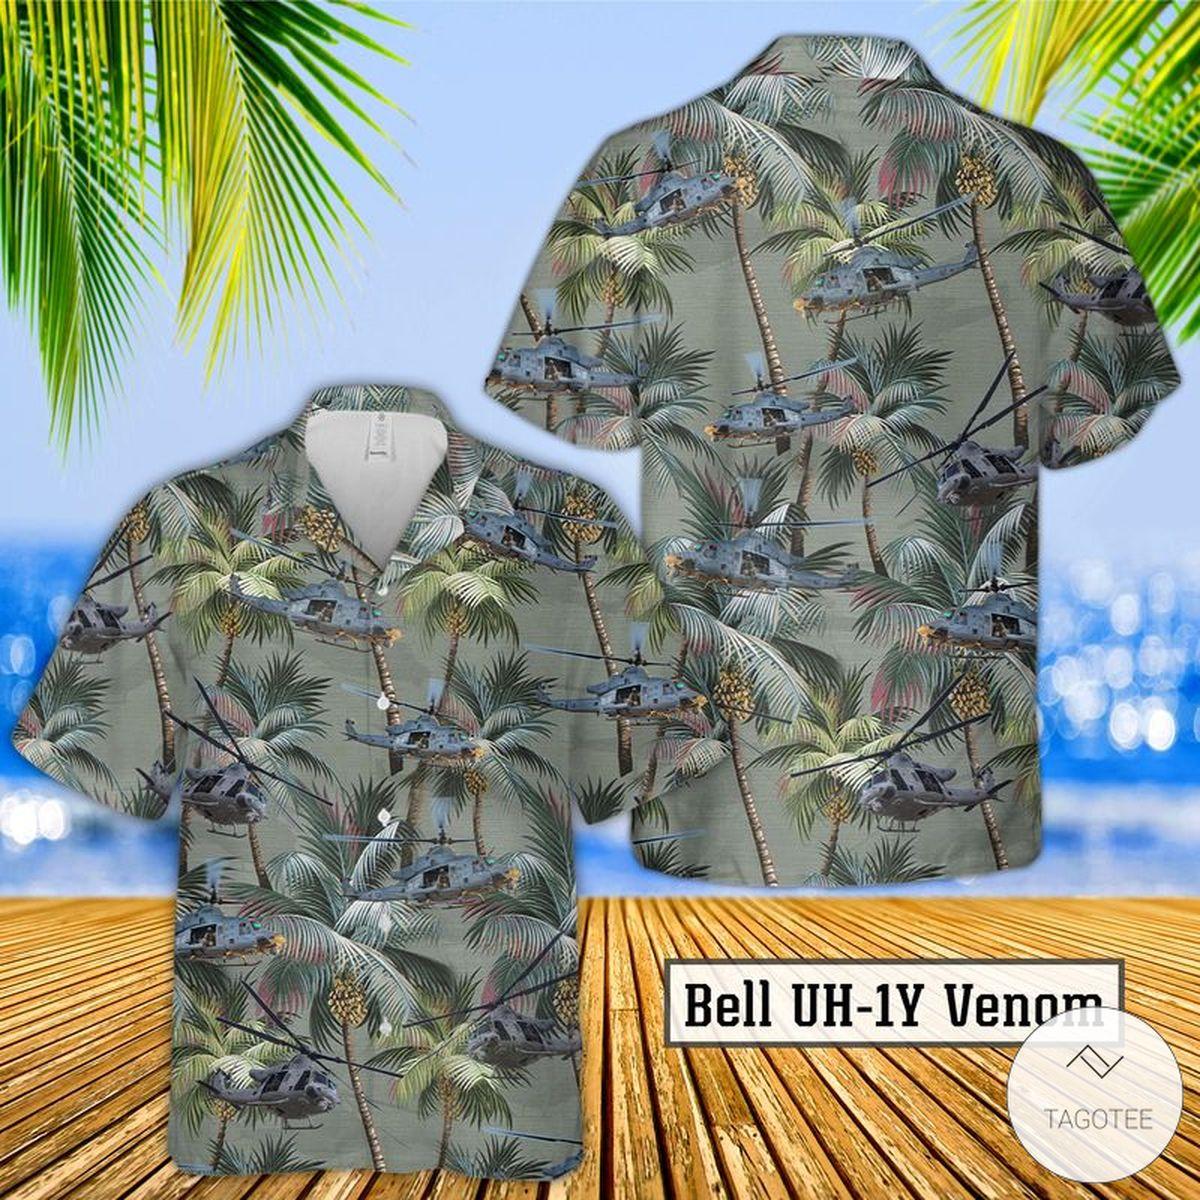 Bell UH-1Y Venom Hawaiian Shirt, Beach Shorts